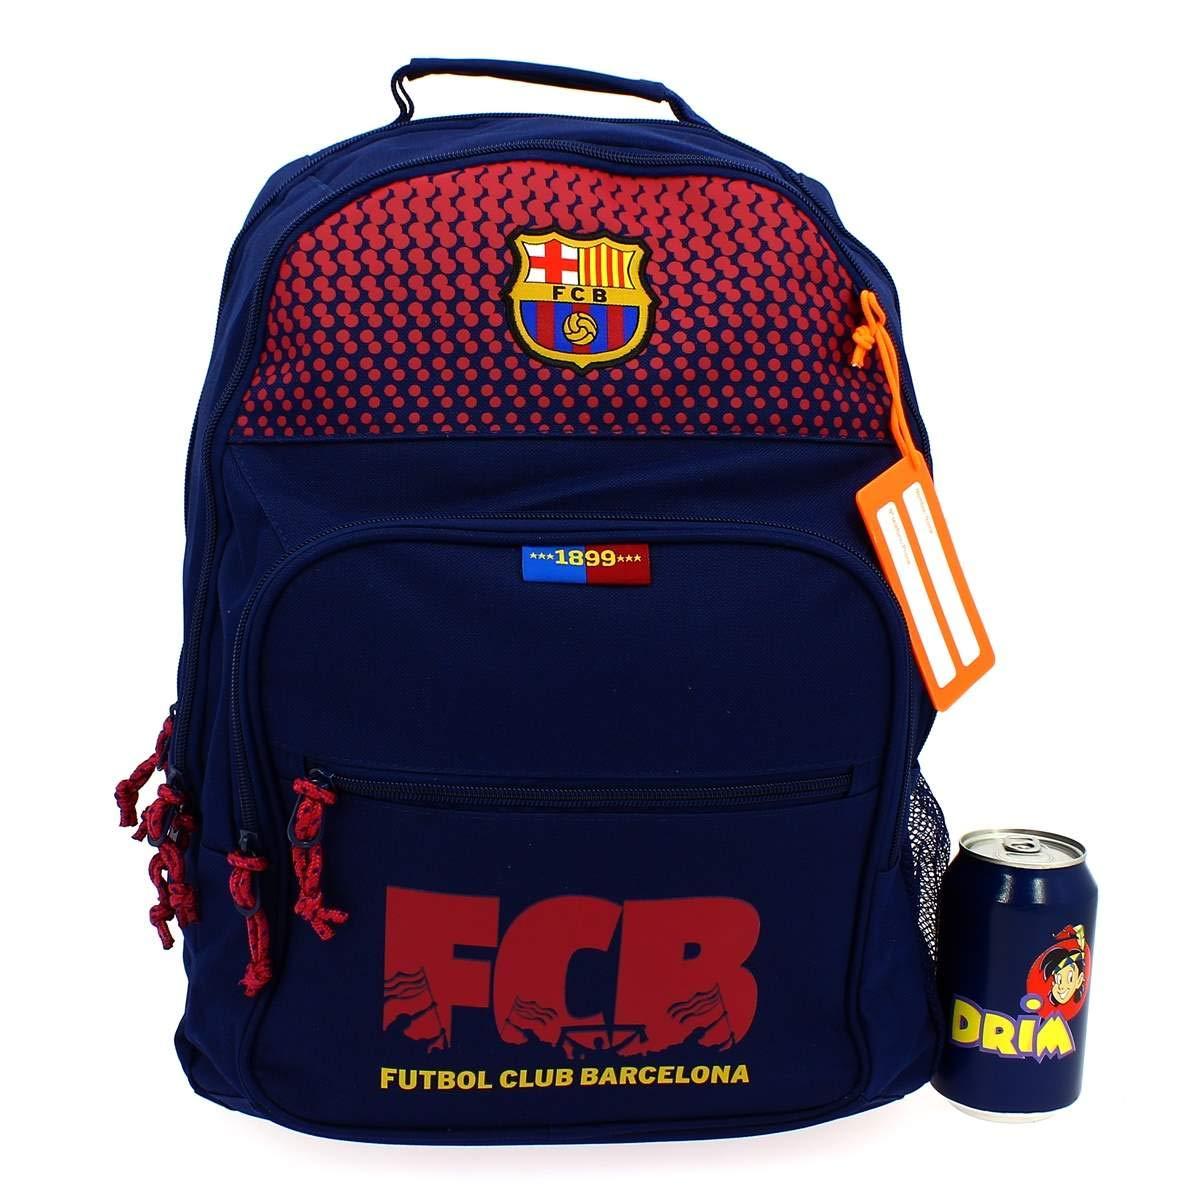 Safta Mochila FC Barcelona Corporativa Oficial Mochila Escolar, 320x160x420mm